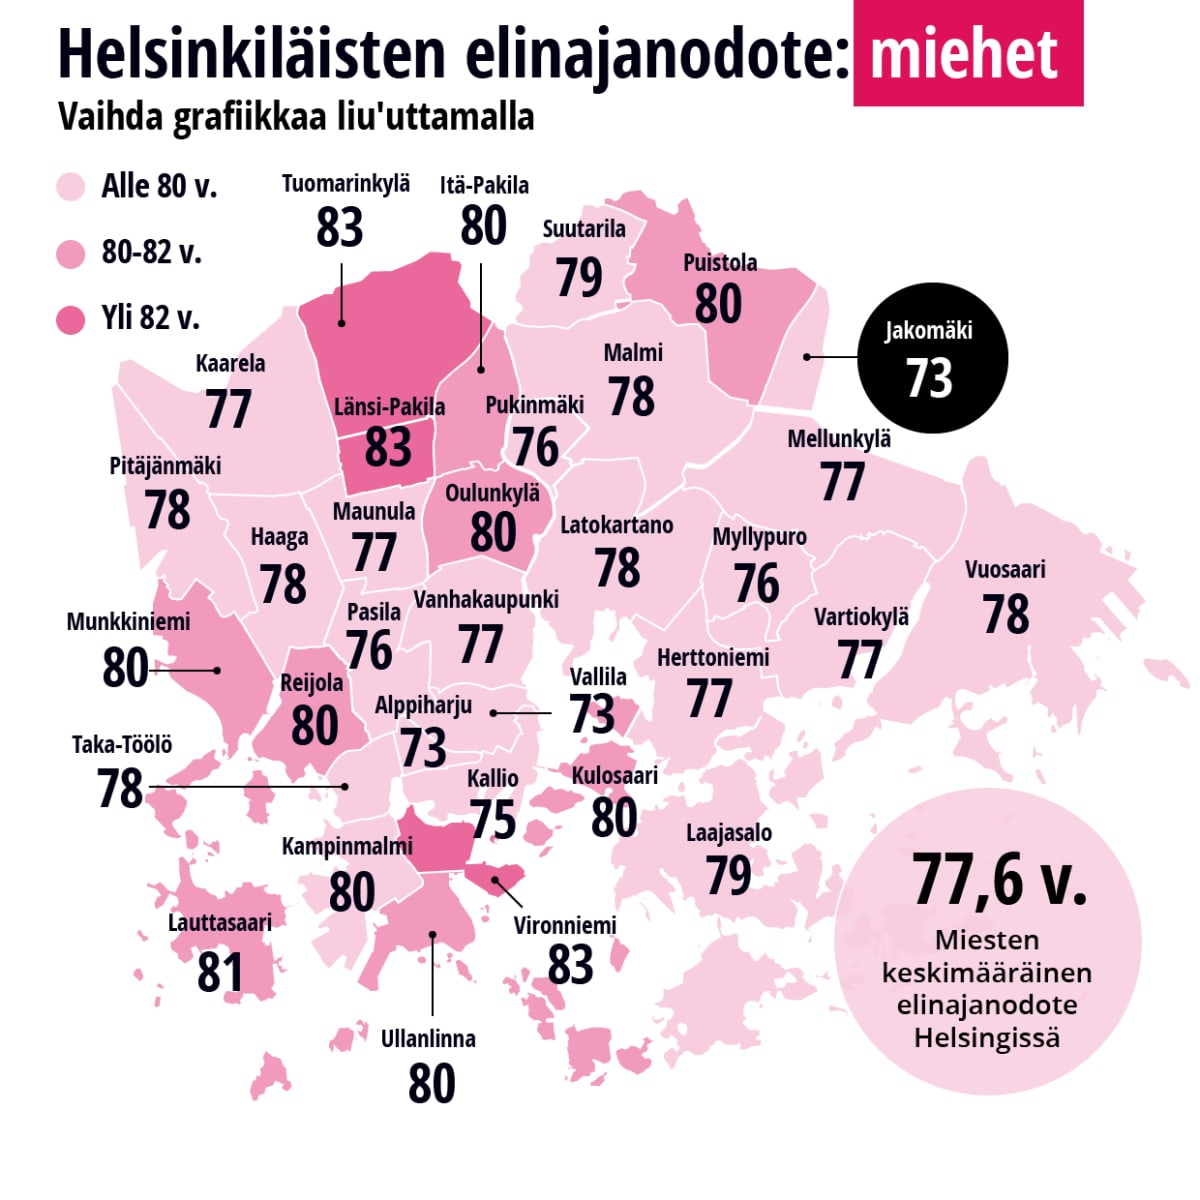 Elinajanodote Helsingissä (miehet)